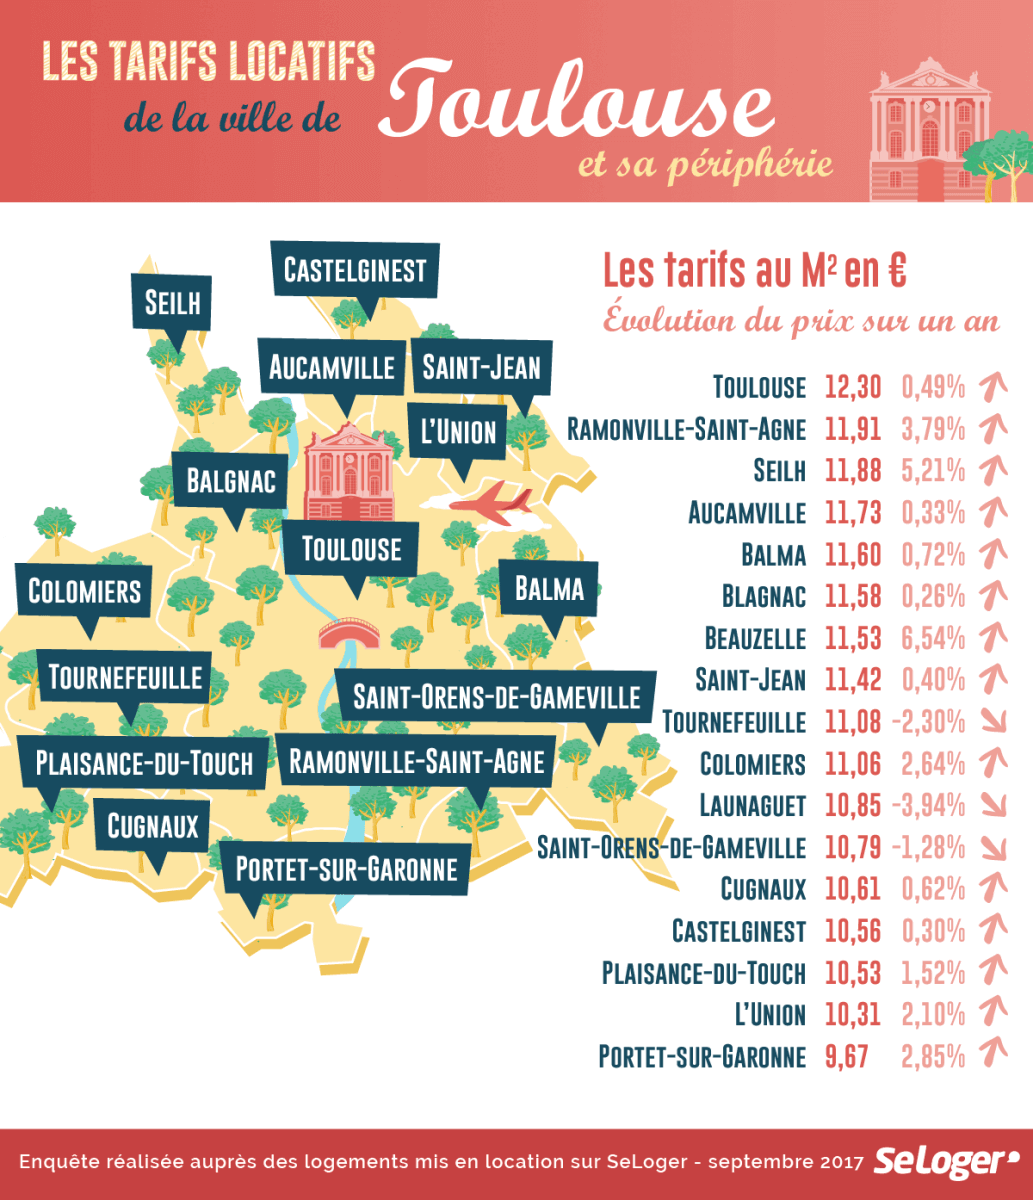 tarif_locatif_toulouse_peripherie_immobilier